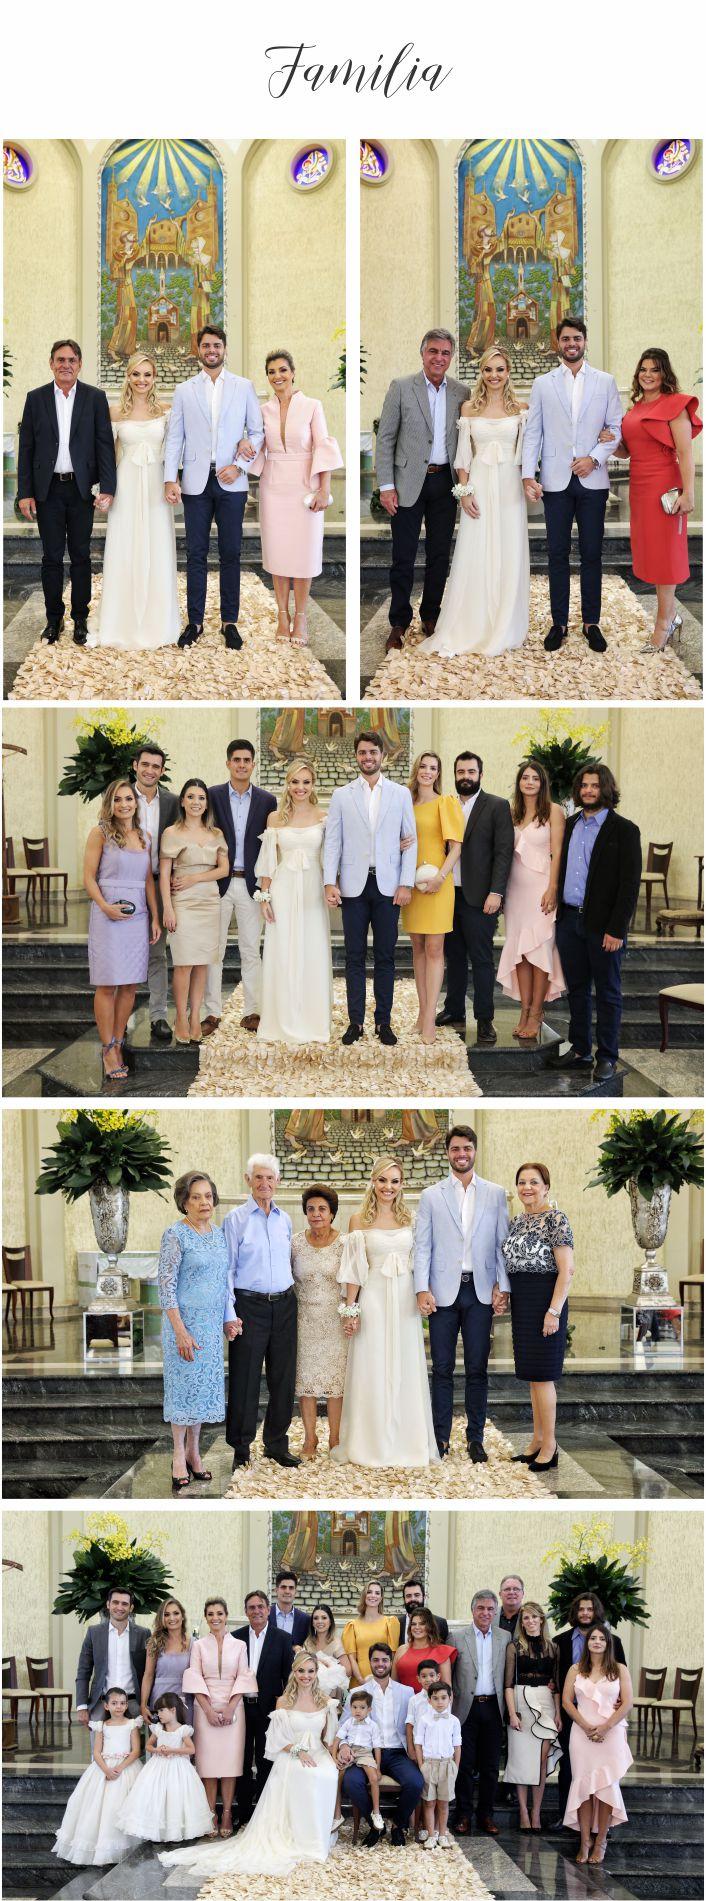 Casamento religioso Layla e William família